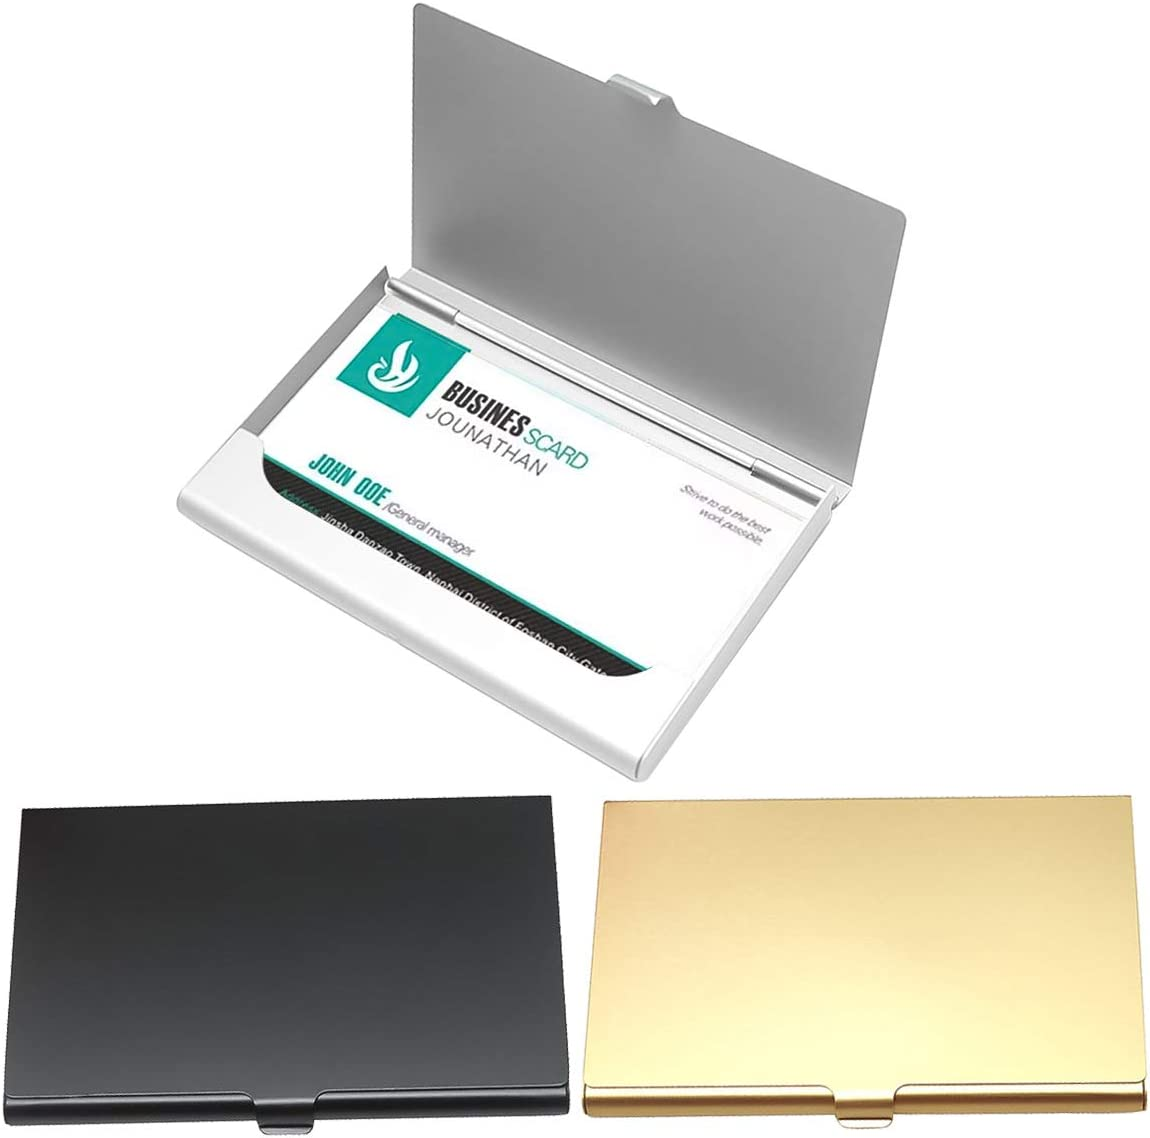 INHEMI Porte Carte De Cr/édit,Lot de 3 Porte Carte de Visite en INOX,Porte Carte Bancaire Protection Carte Bancaire RFID Porte Carte Anti Piratage Etui Carte Bancaire Anti Piratage